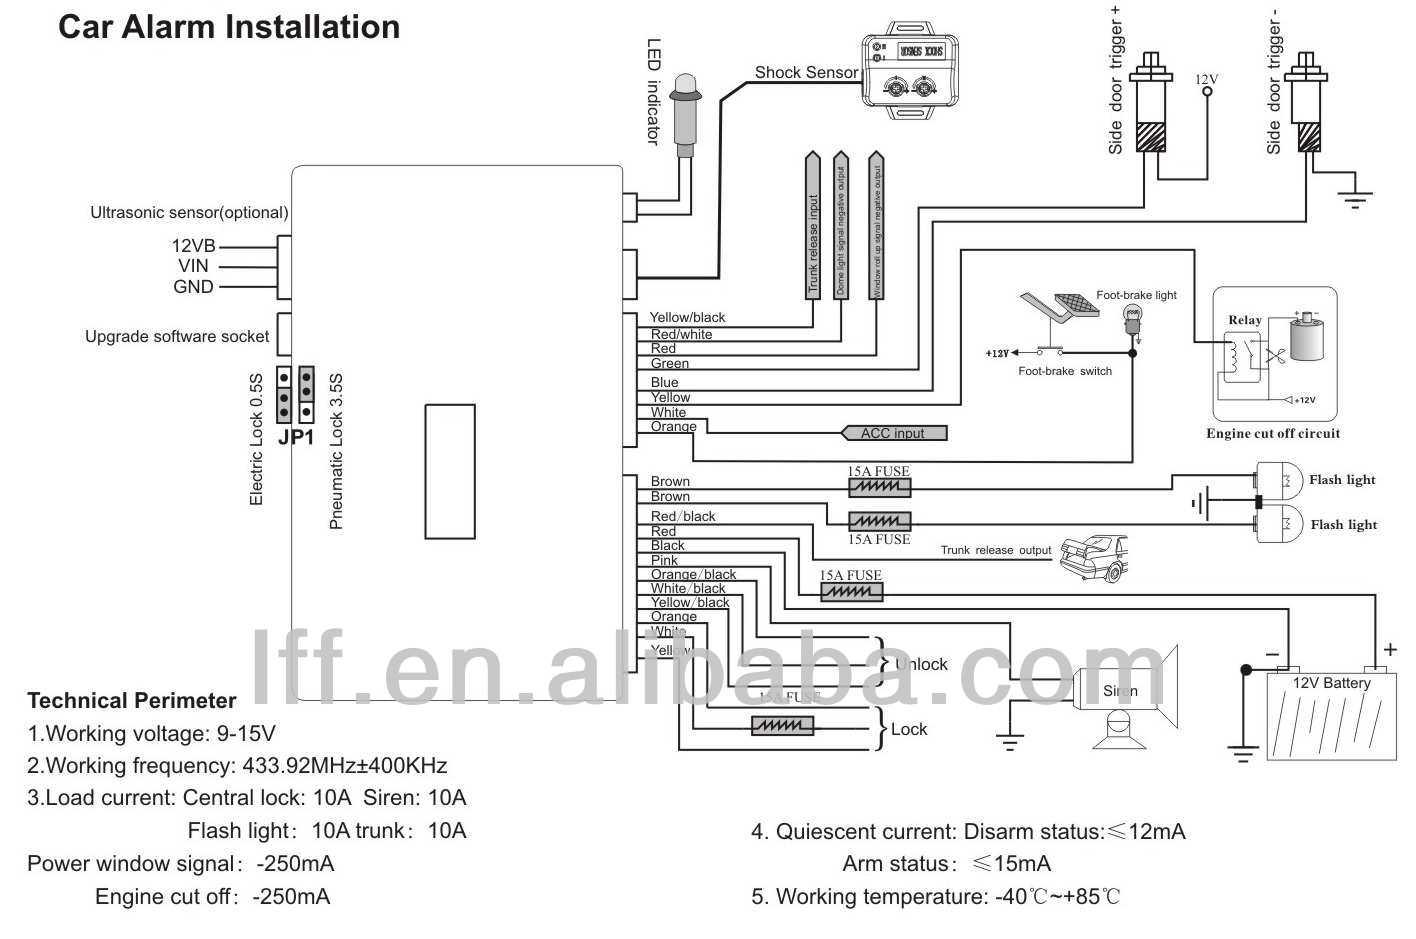 Famous clifford car alarm wiring diagram illustration best images clifford car alarm wiring diagram clifford wiring diagrams cheapraybanclubmaster Gallery